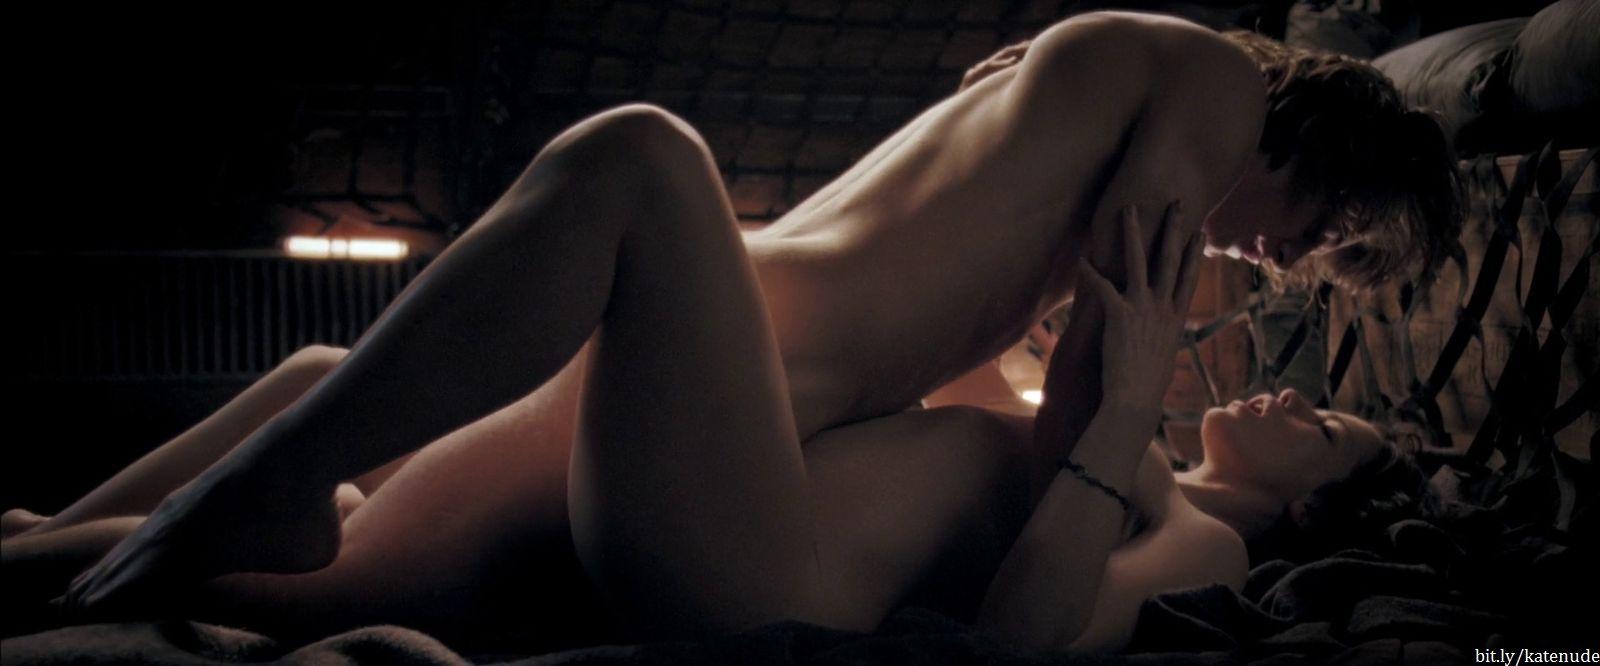 Kate beckinsale nude scene